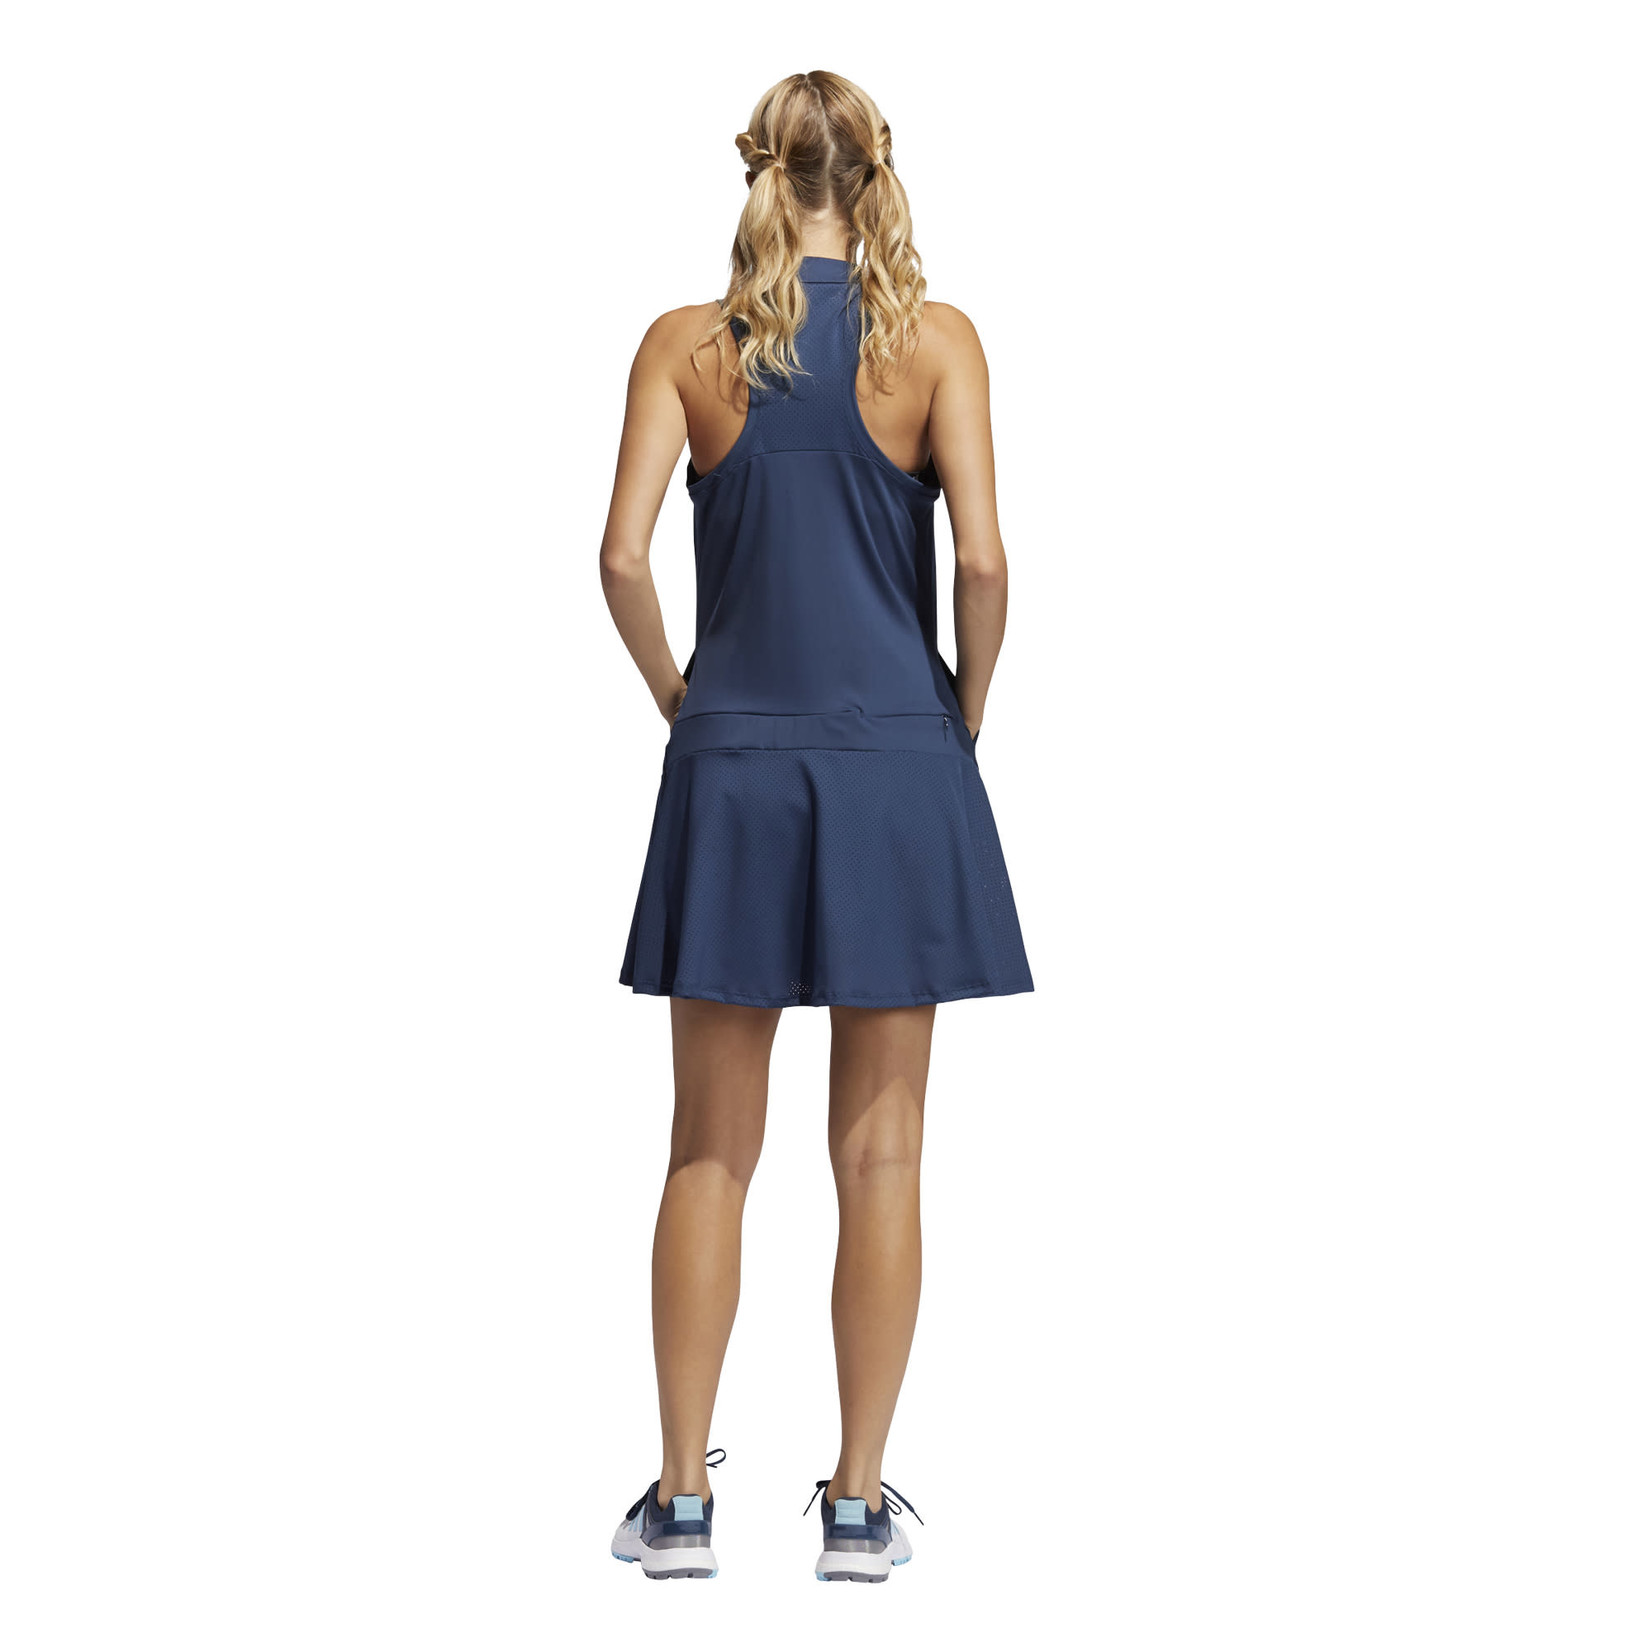 Adidas Adidas W Sport Dress - Navy XL